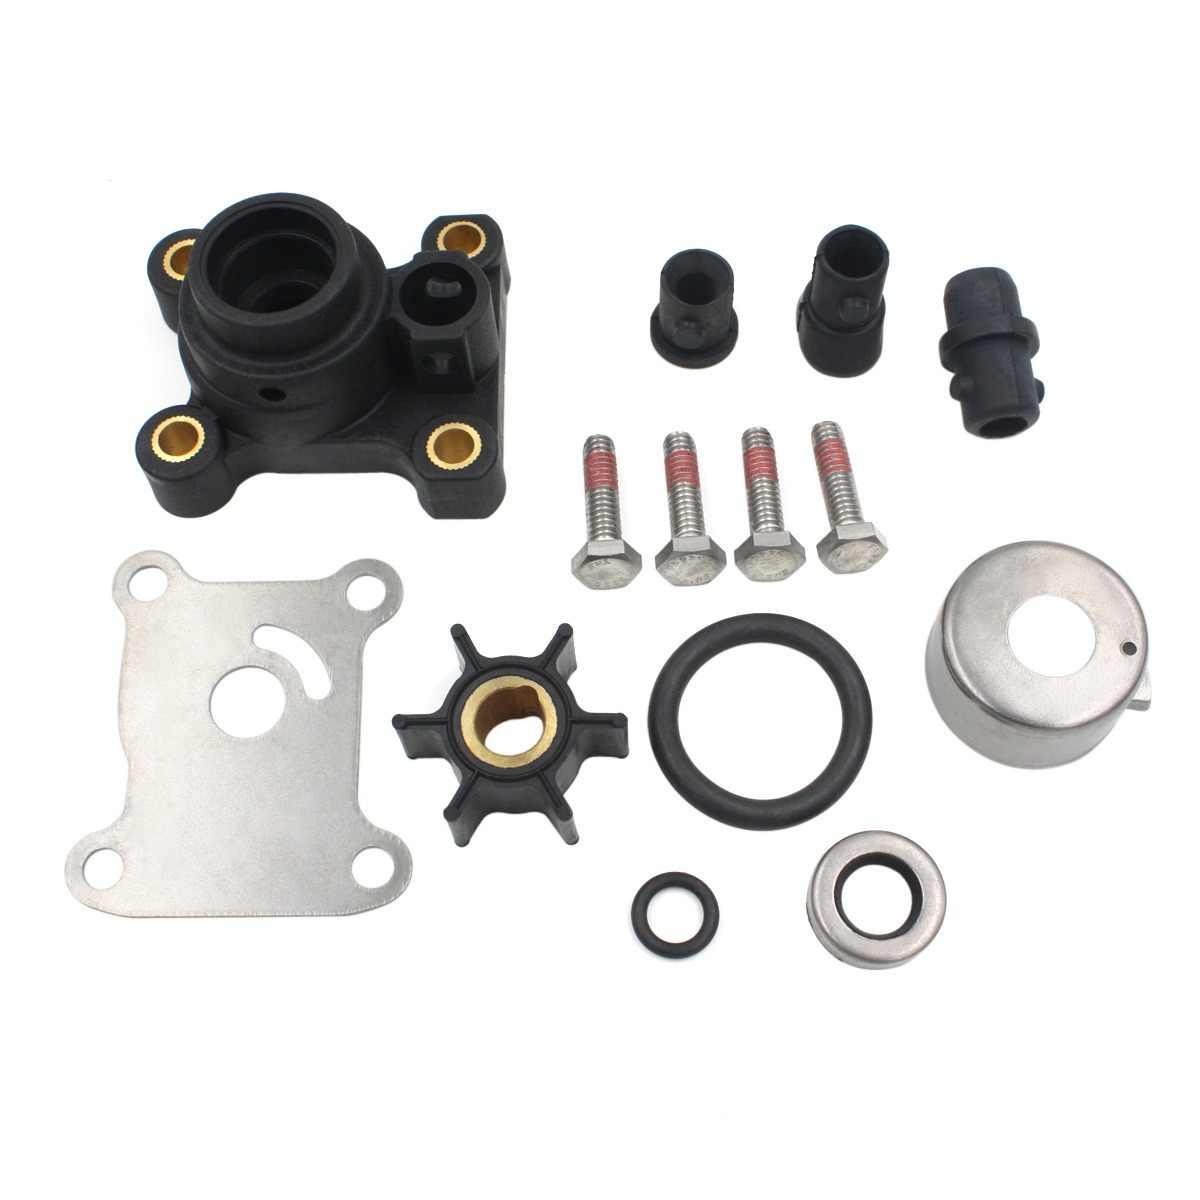 medium resolution of 9 9hp 15hp impeller water pump repair kit for johnson evinrude 394711 0394711 391698